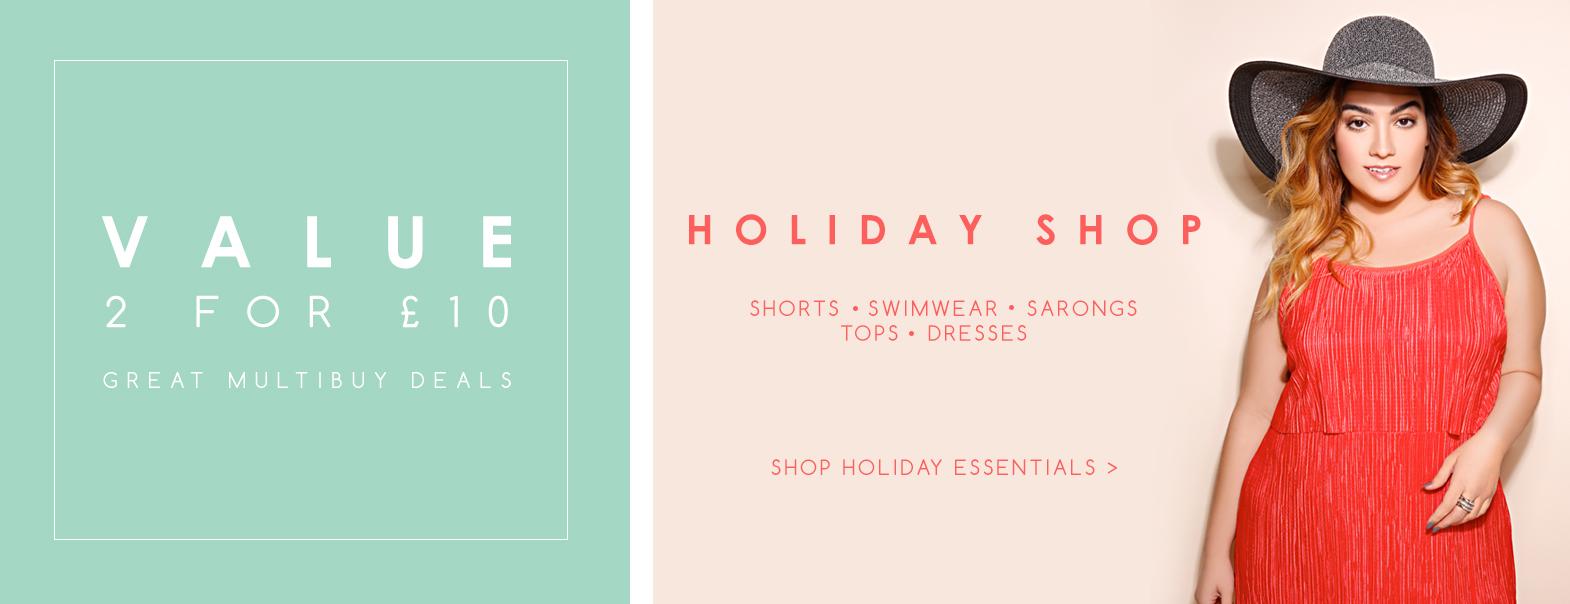 Shop Holiday Shop >